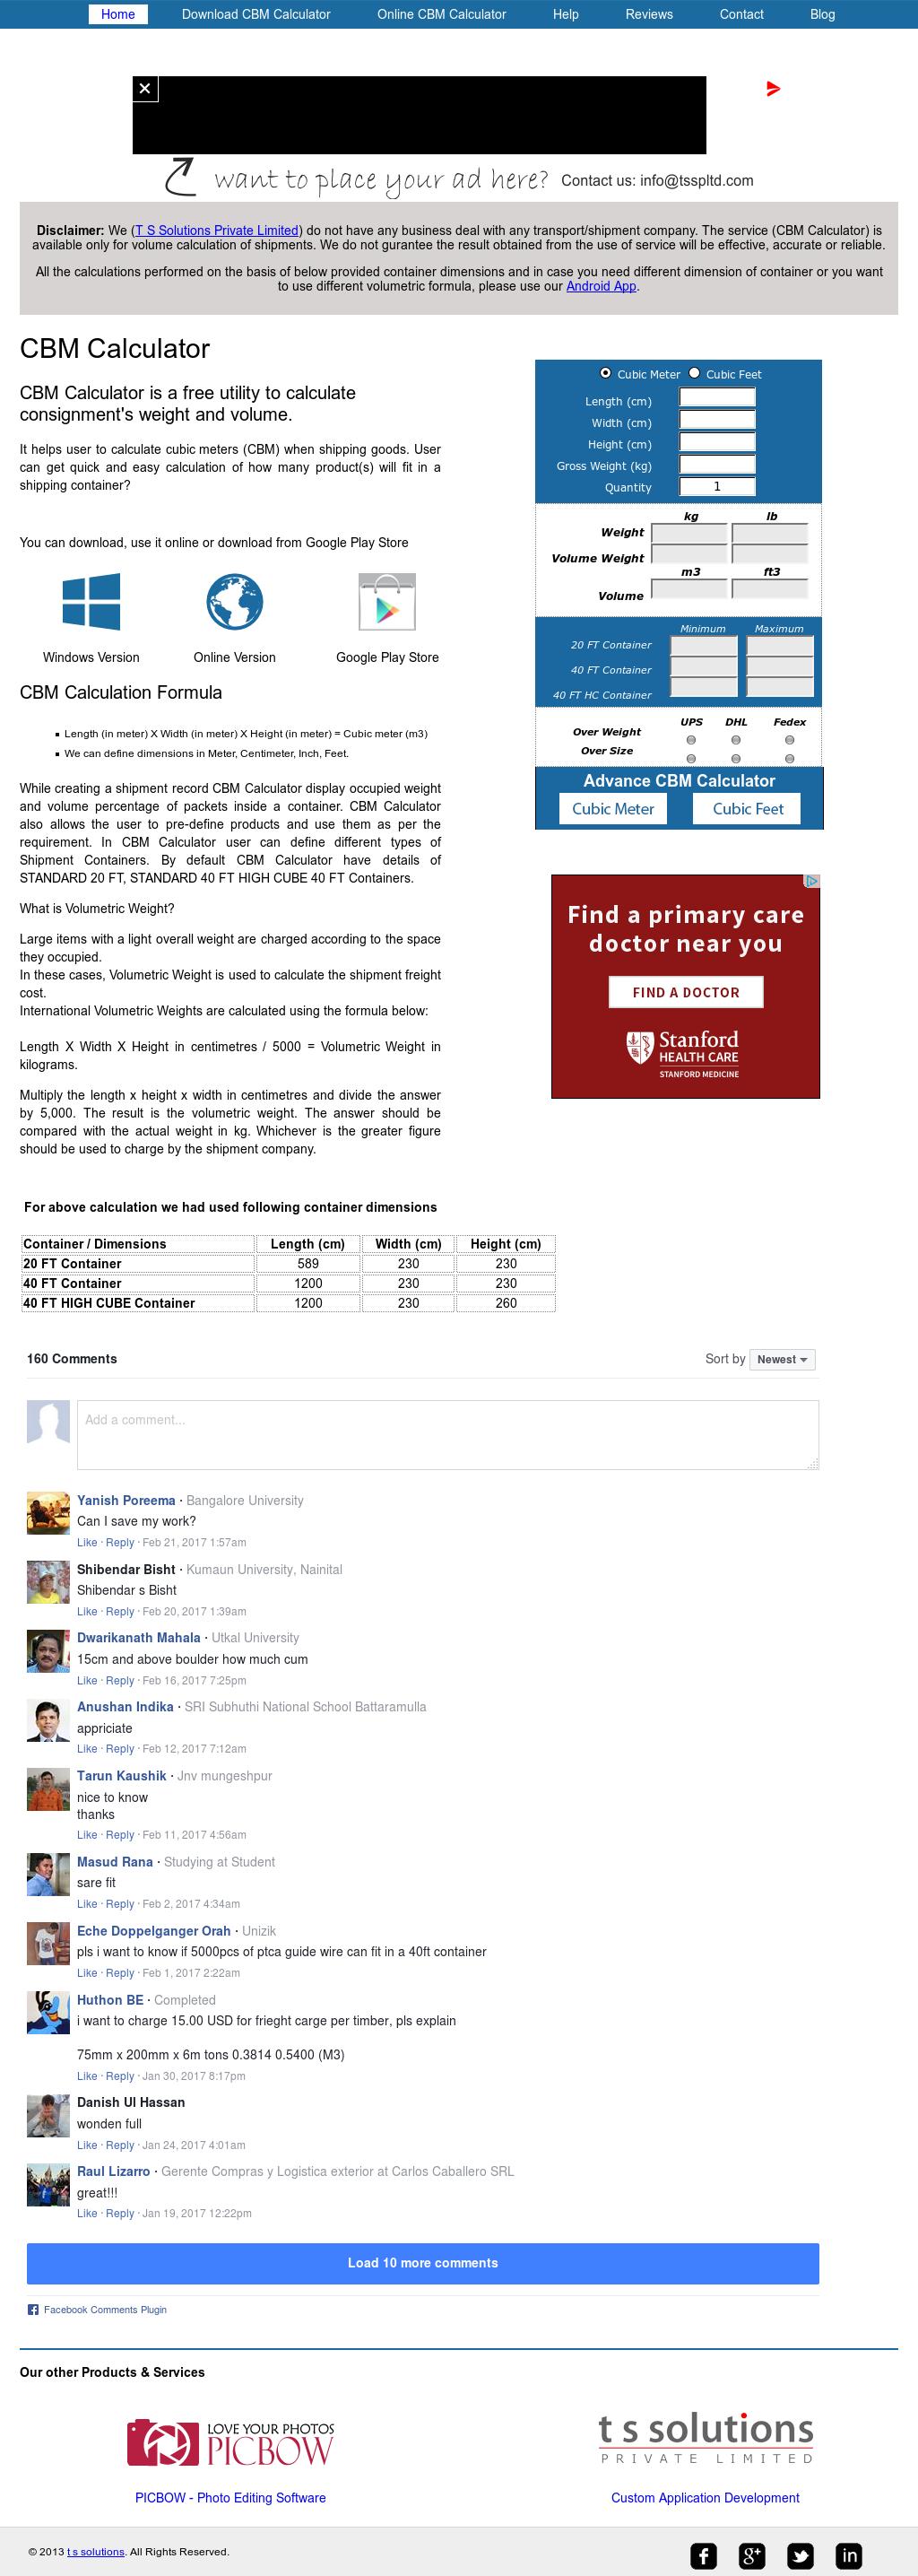 Cbm Calculator Competitors, Revenue and Employees - Owler